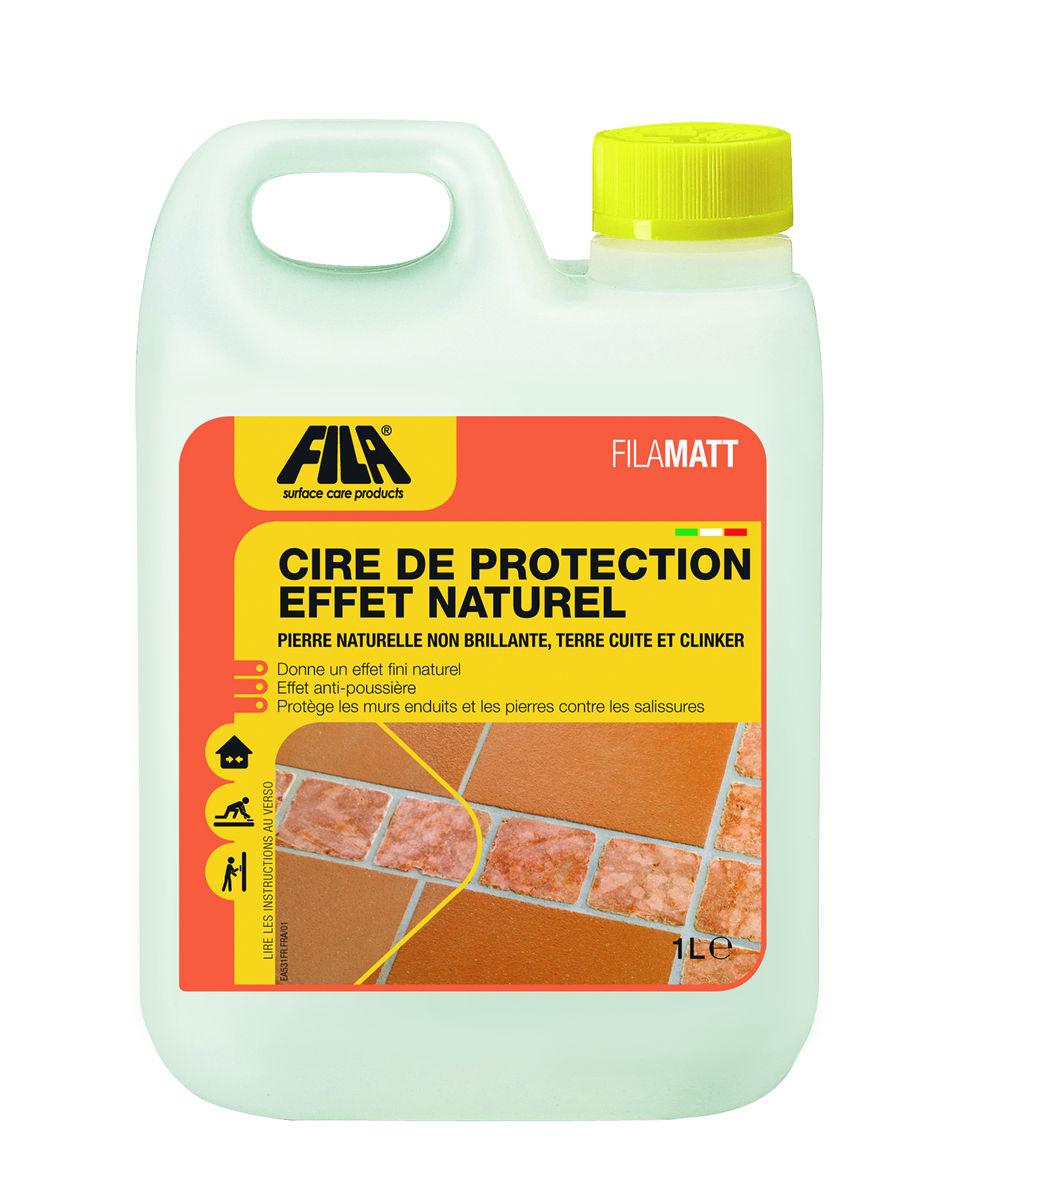 Cire de protection effet naturel filamatt for Fila produit carrelage